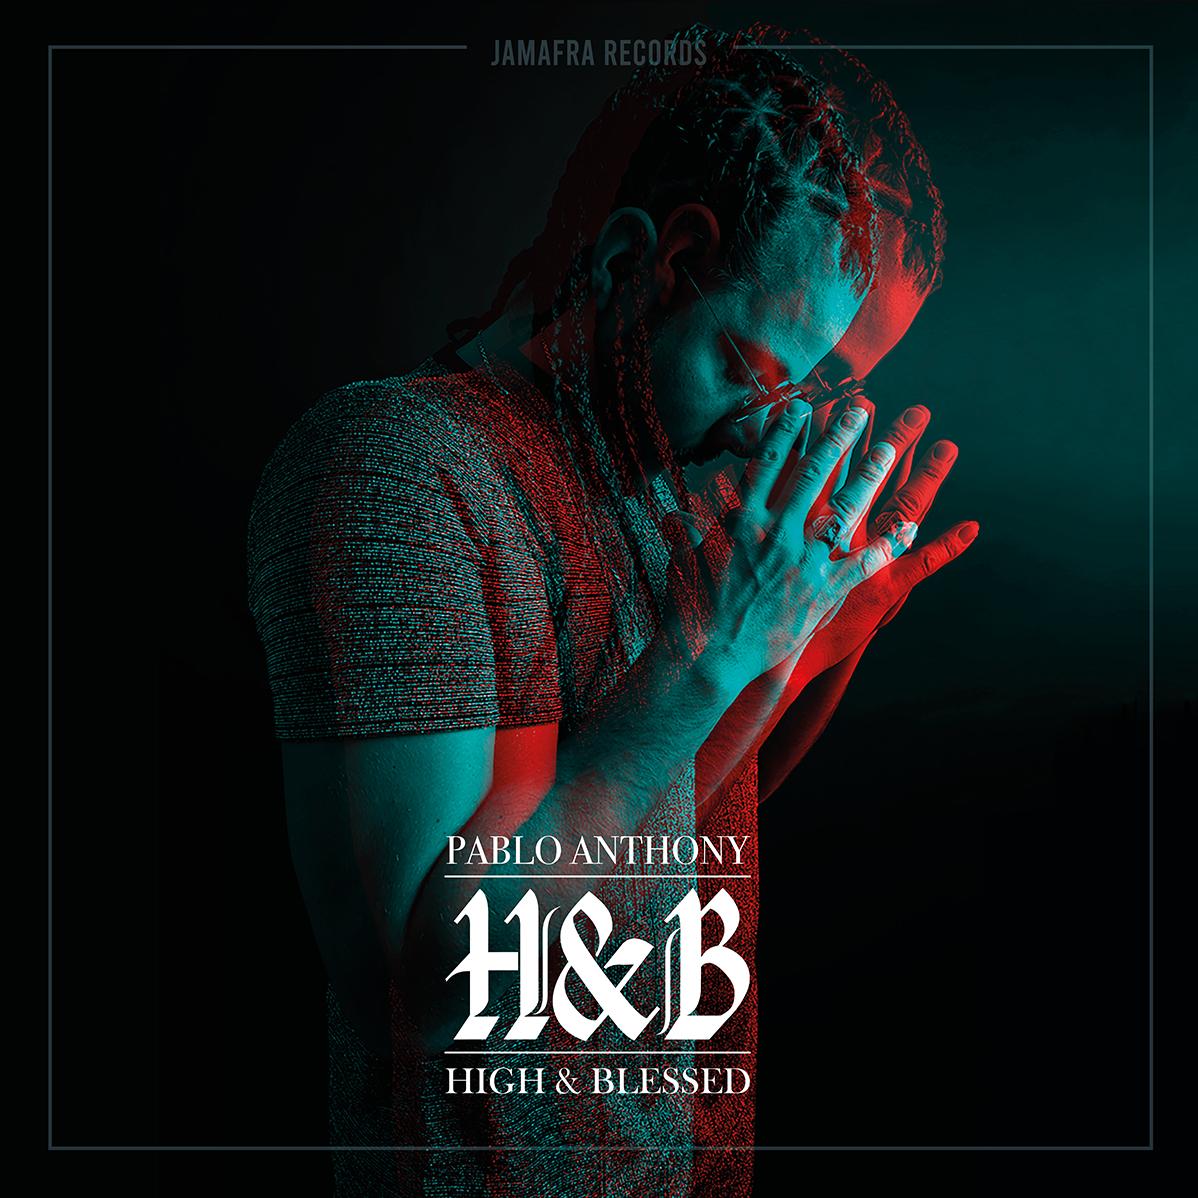 Pablo Anthony : H&B (High & Blessed) (Jamafra Records)